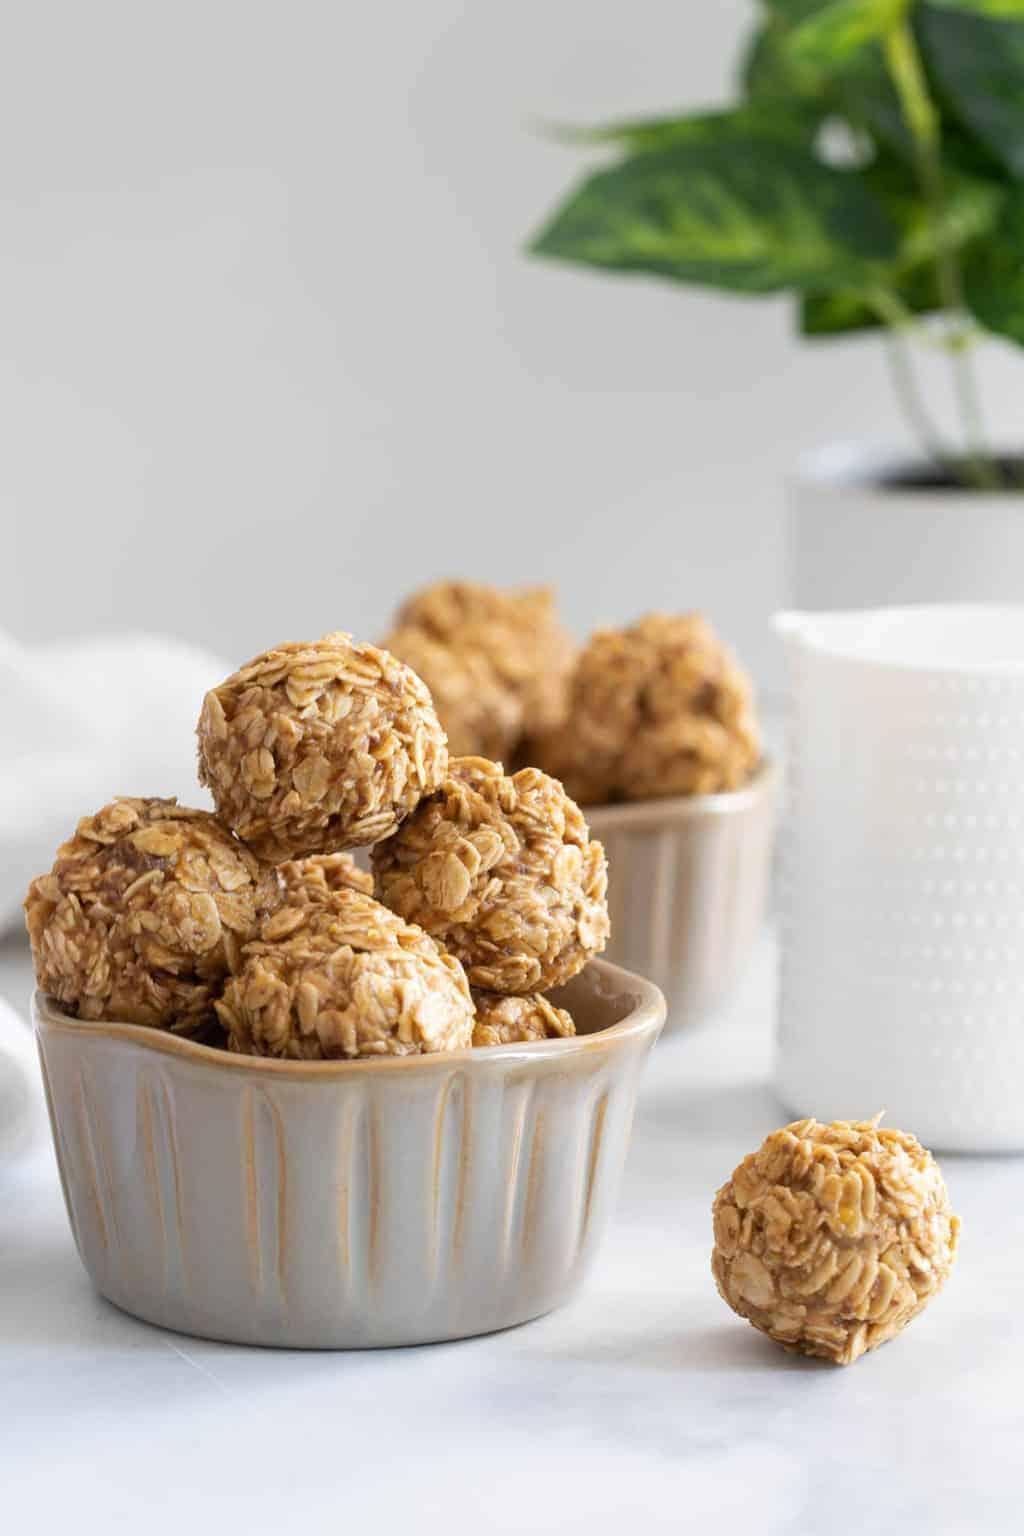 Easy Healthy Peanut Butter No-Bake Energy Bites